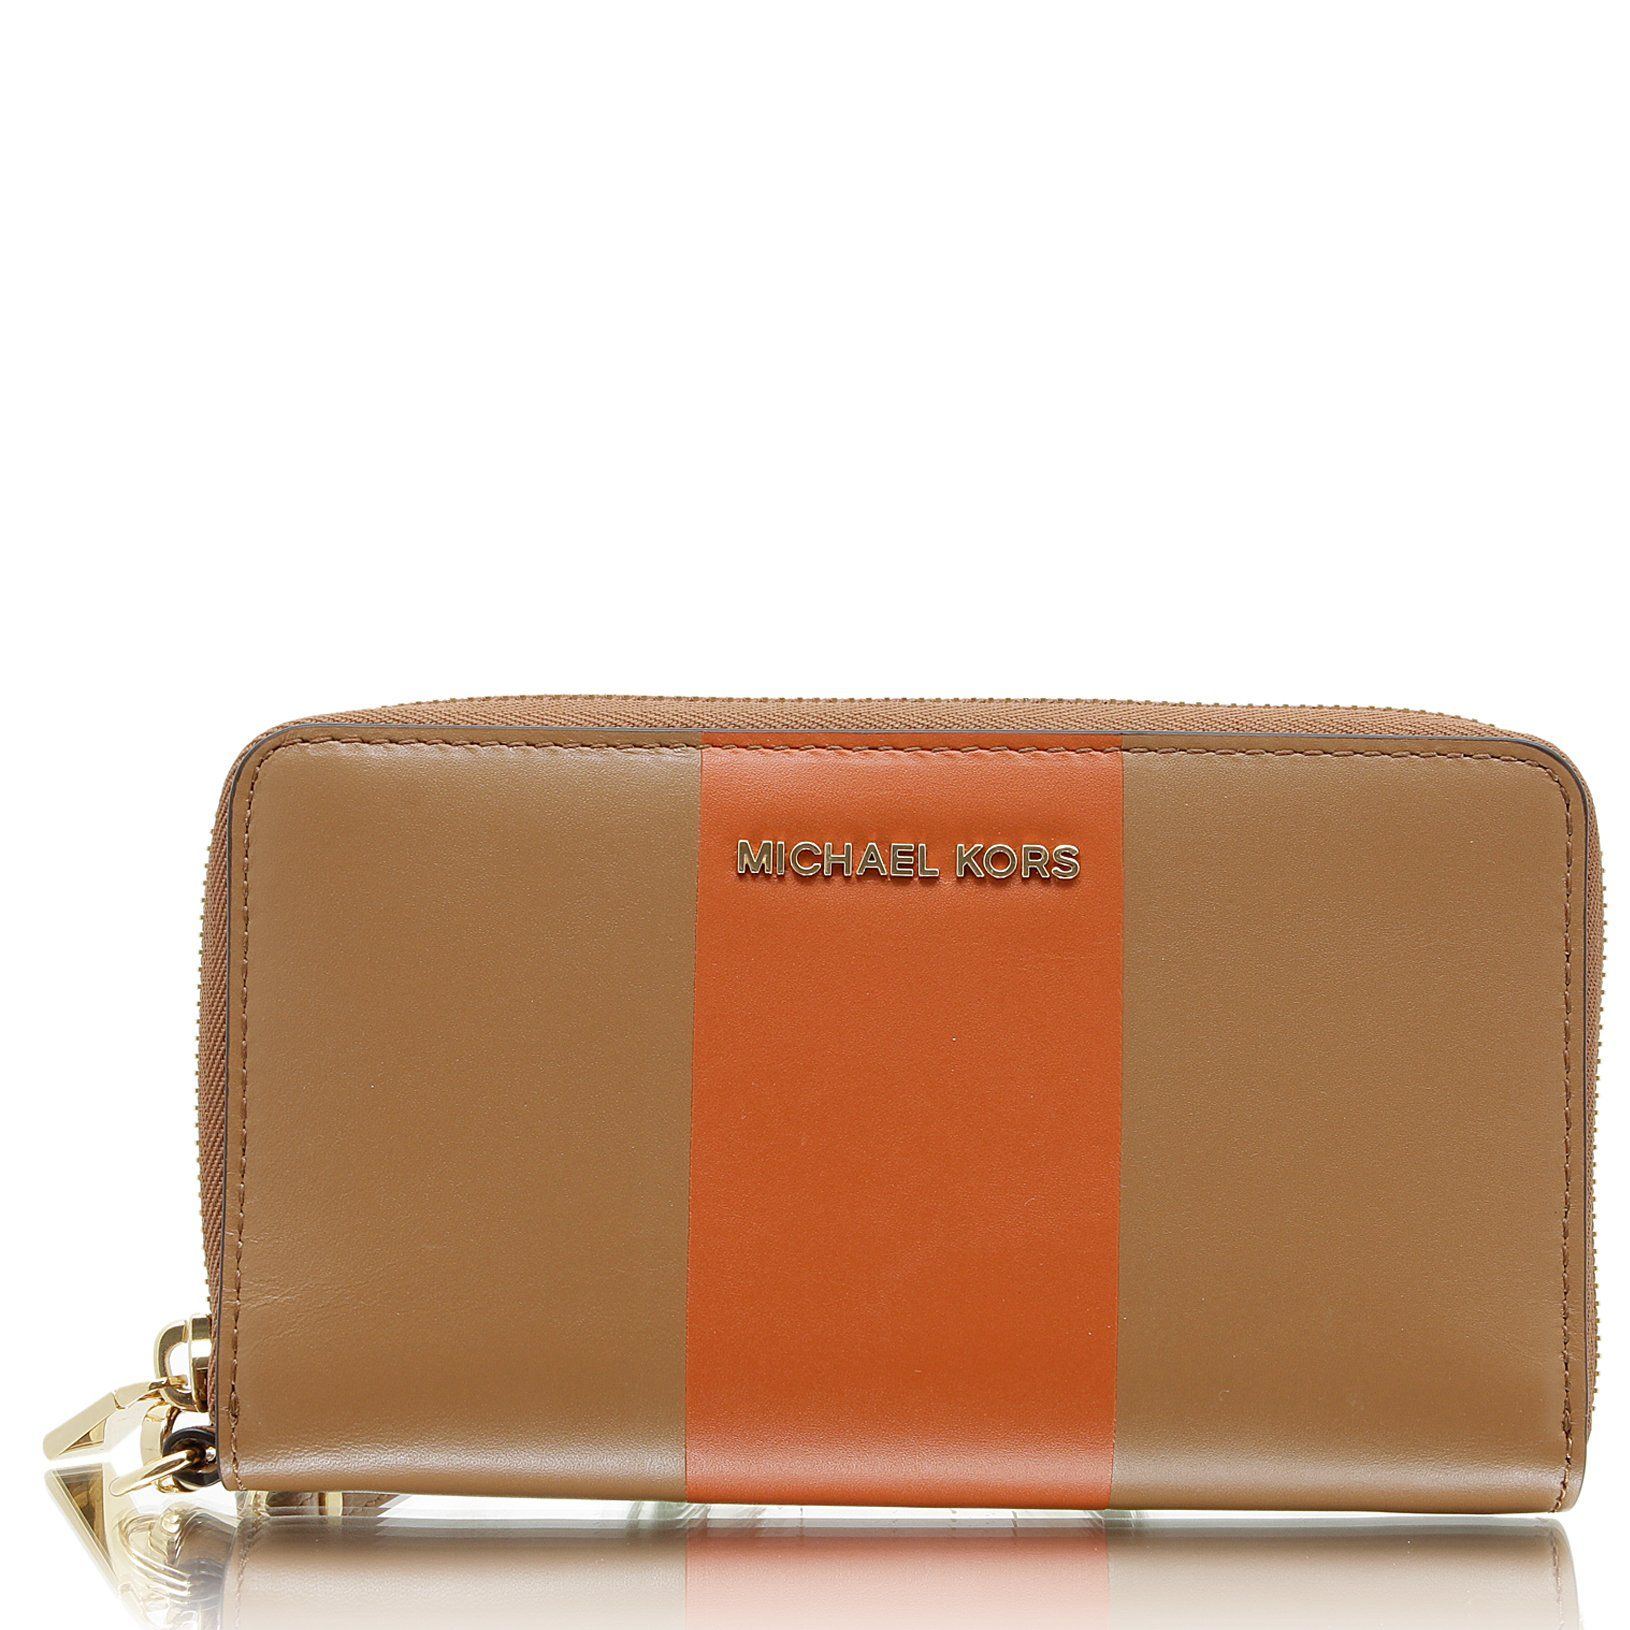 MICHAEL KORS Colorblock Leather Wristlet in Acorn/Orange